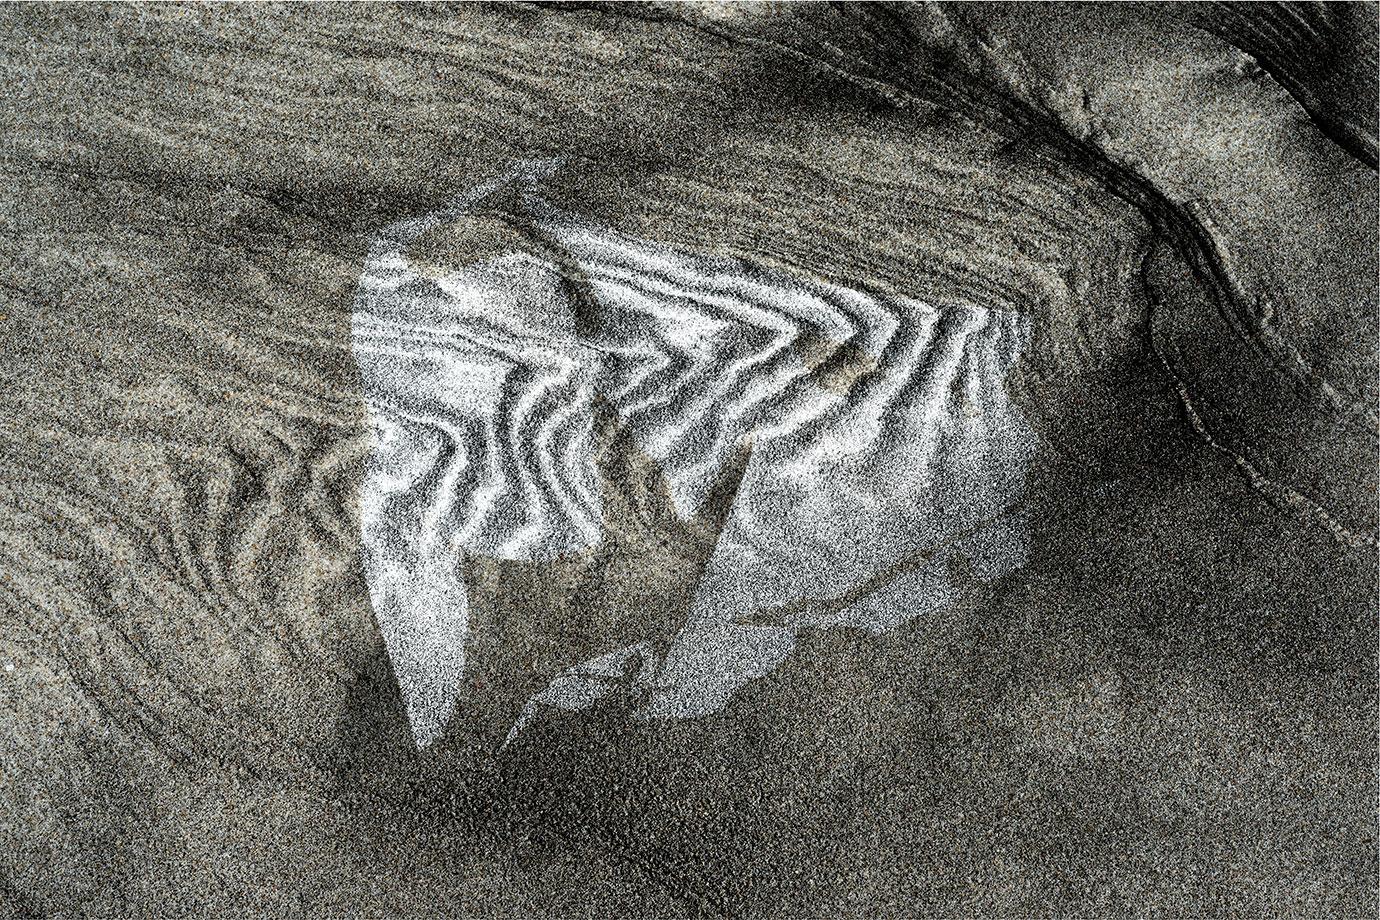 Intertidal 04 Mangawhai Bruce Foster NZ